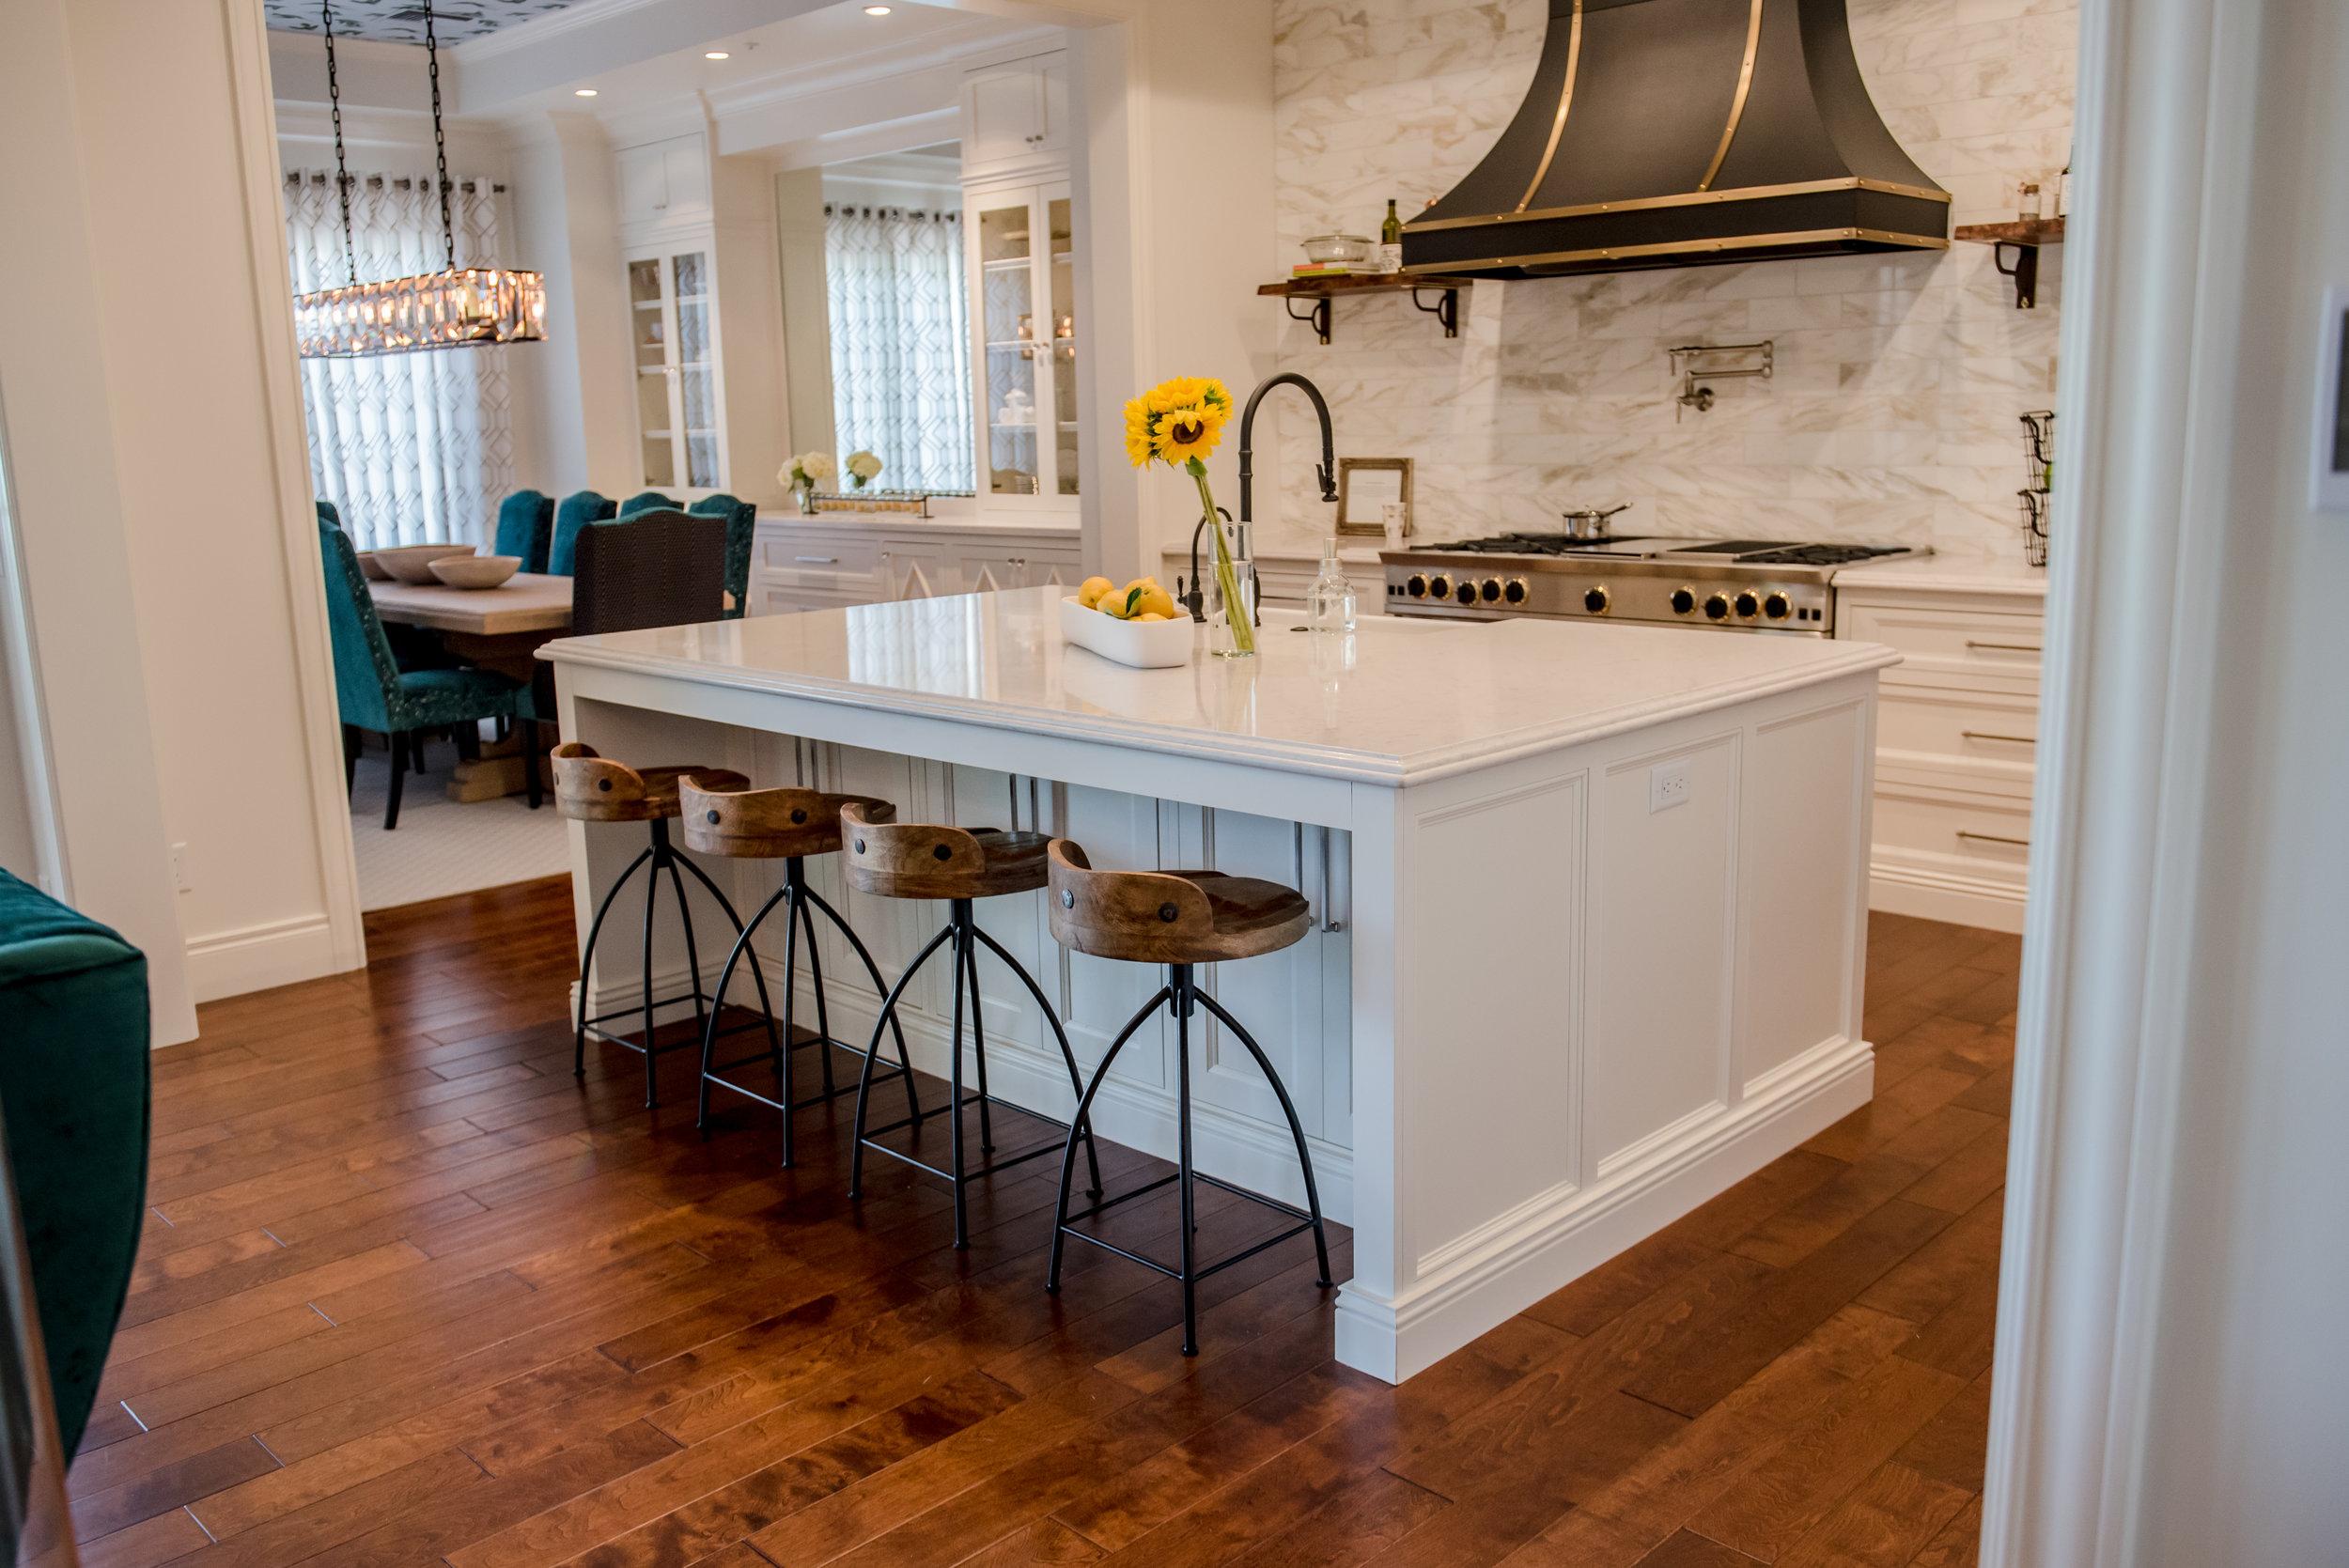 17+Kitchen+Openconcept+Accessories+Transitional+Hood+Brass+Black+Range+Marble+Calacatta+Openshelves.jpg